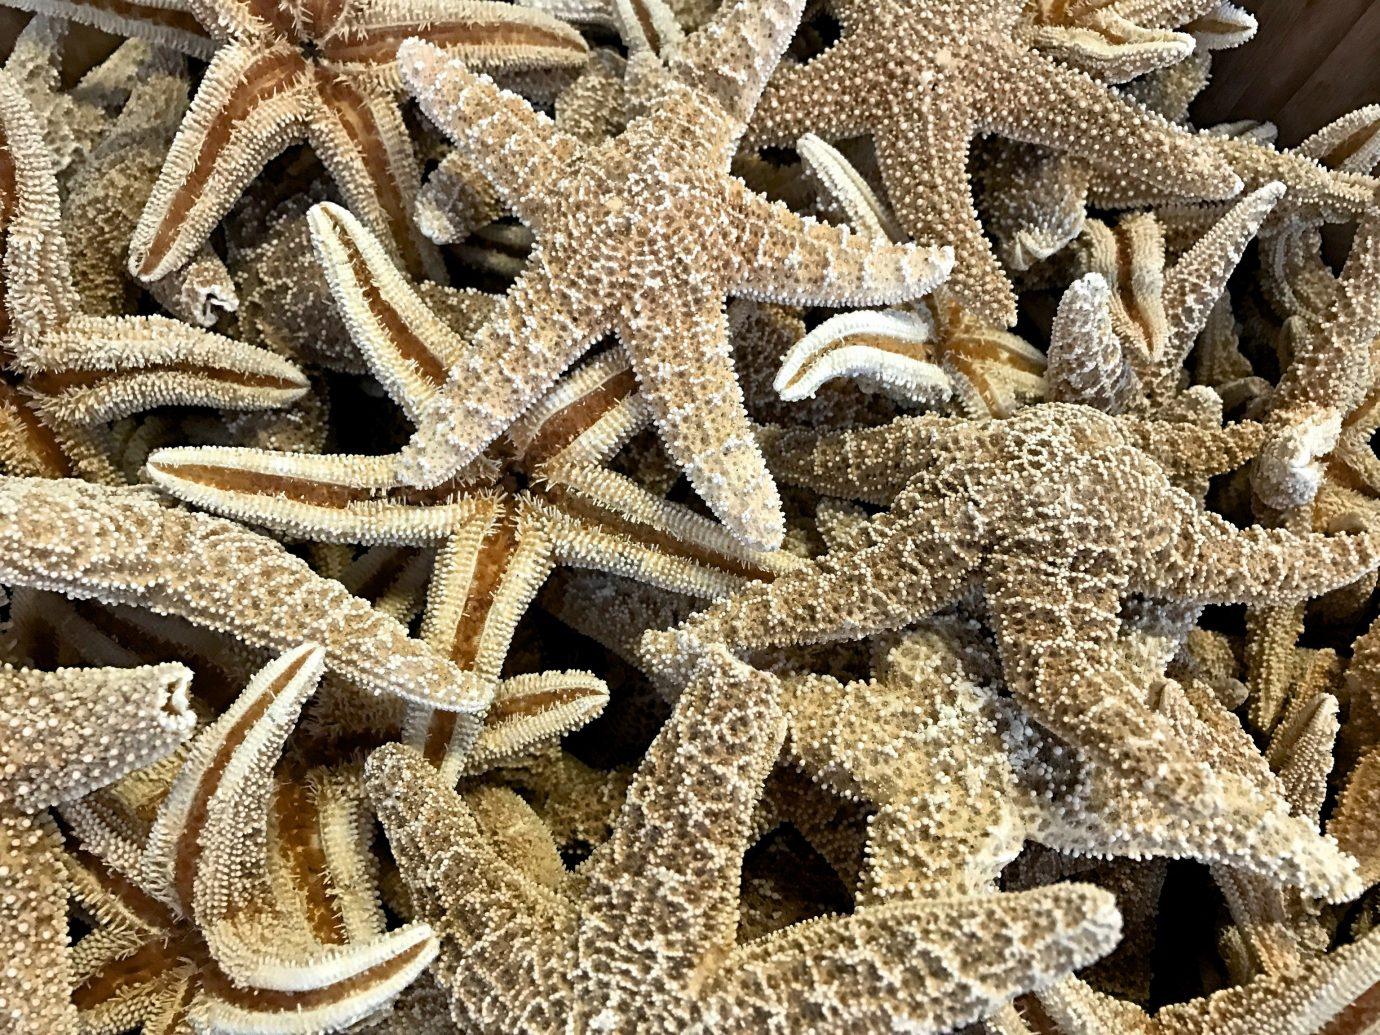 Trip Ideas invertebrate animal starfish marine invertebrates echinoderm coral food pattern material different several